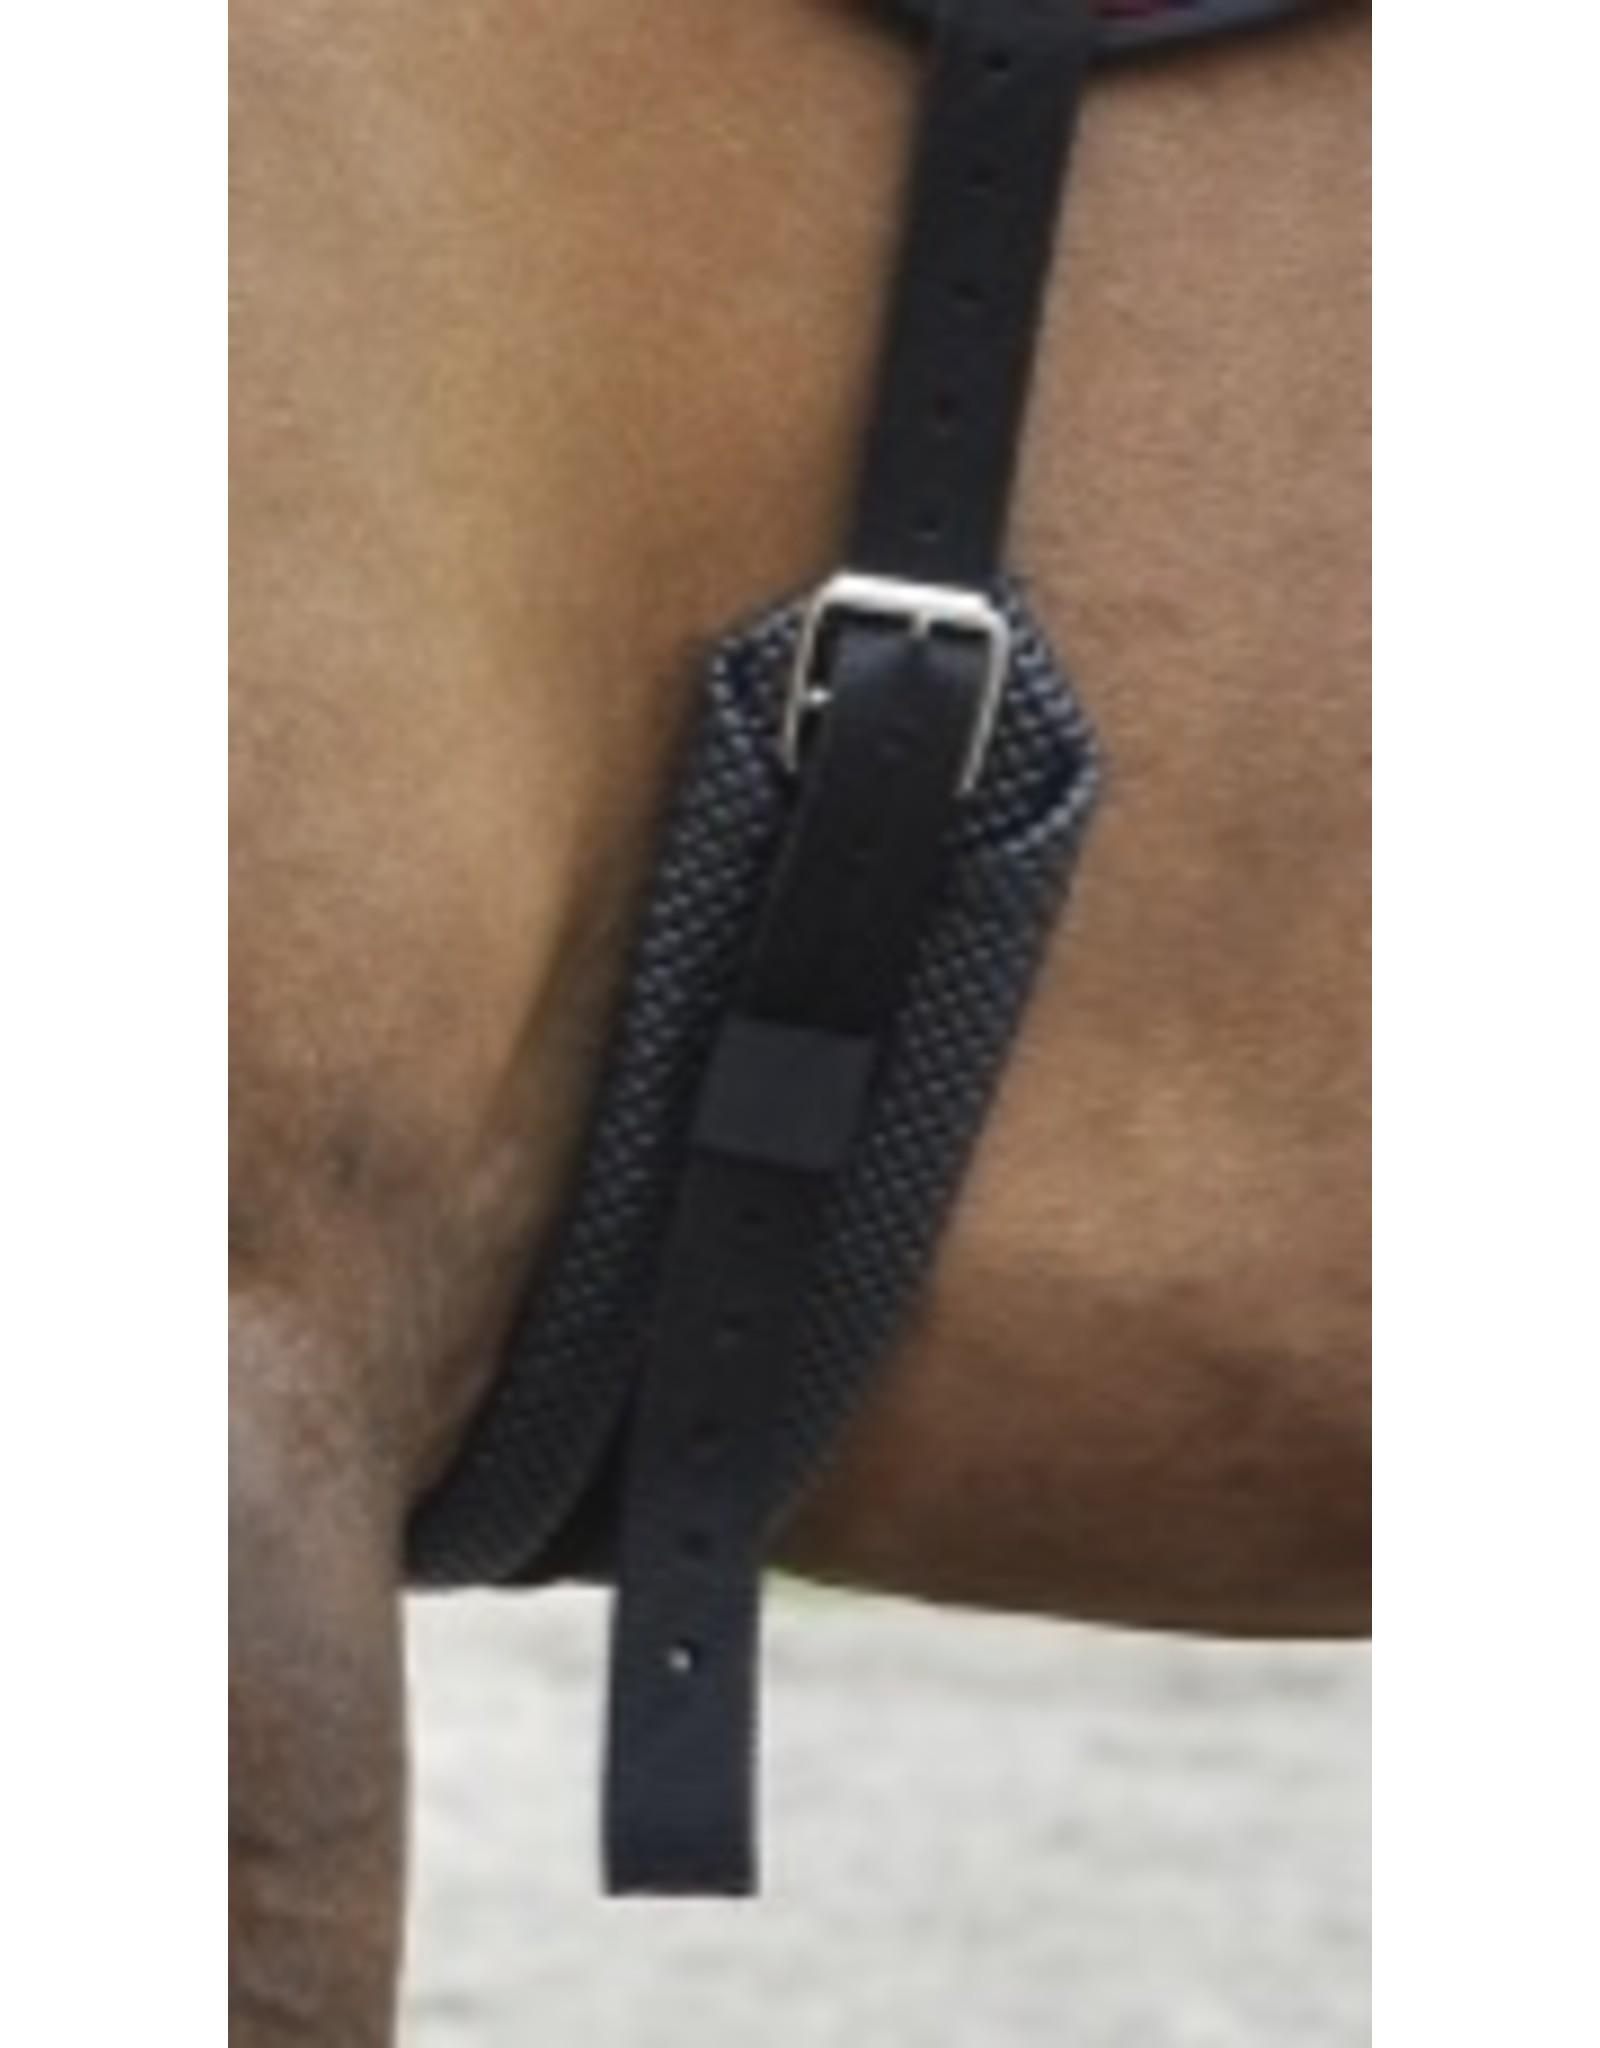 Seilerei Brockamp Barebackpad gurt einzelne Schnalle